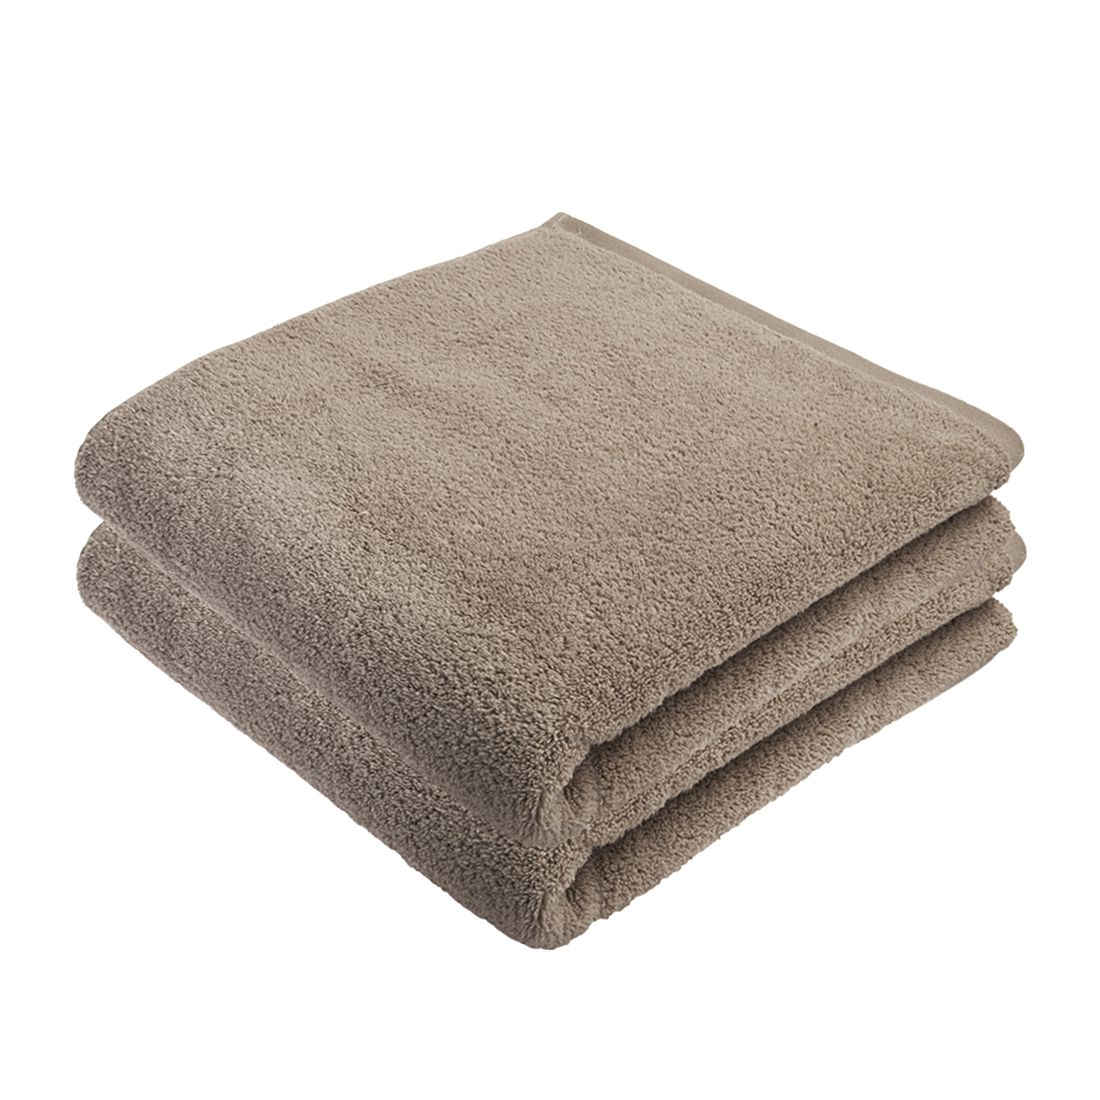 Home 24 - Service de bain pure (lot de 2) - coton - beige, stilana